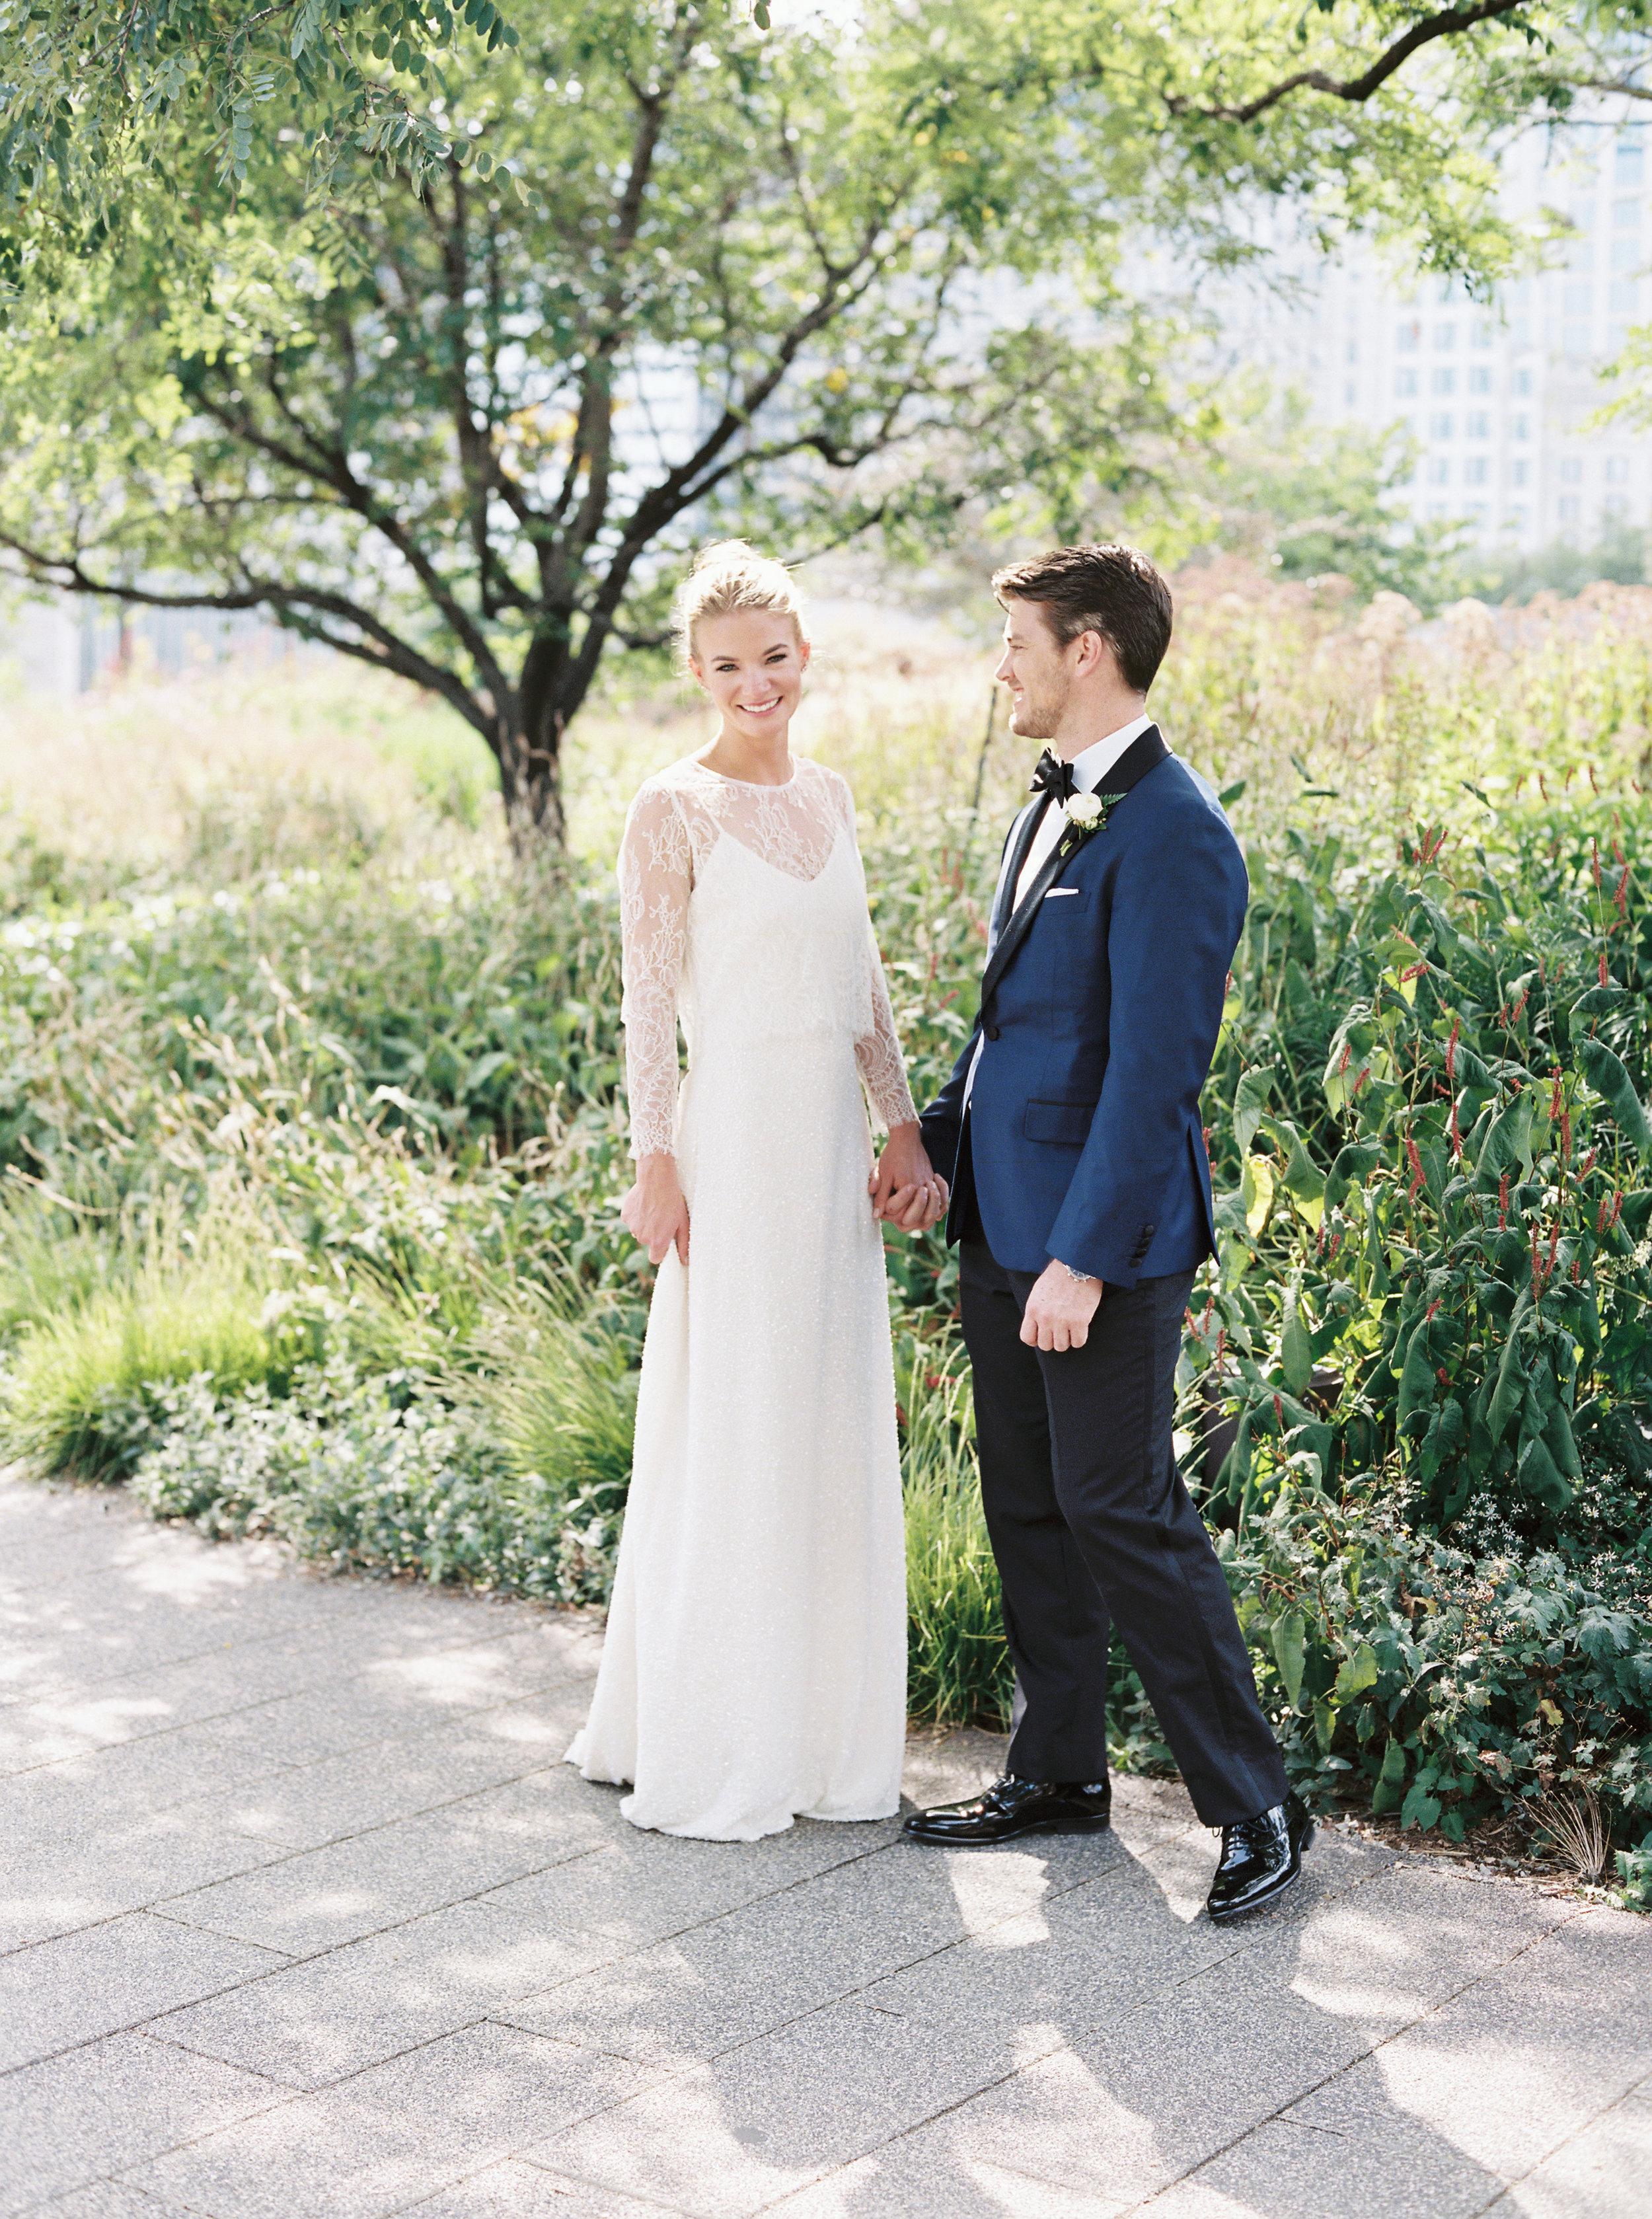 Kyle John l Fine Art Wedding Photography l Chicago, Copenhagen, California, New York, Destination l Blog l Maria and Eric_University Club of Chicago_27